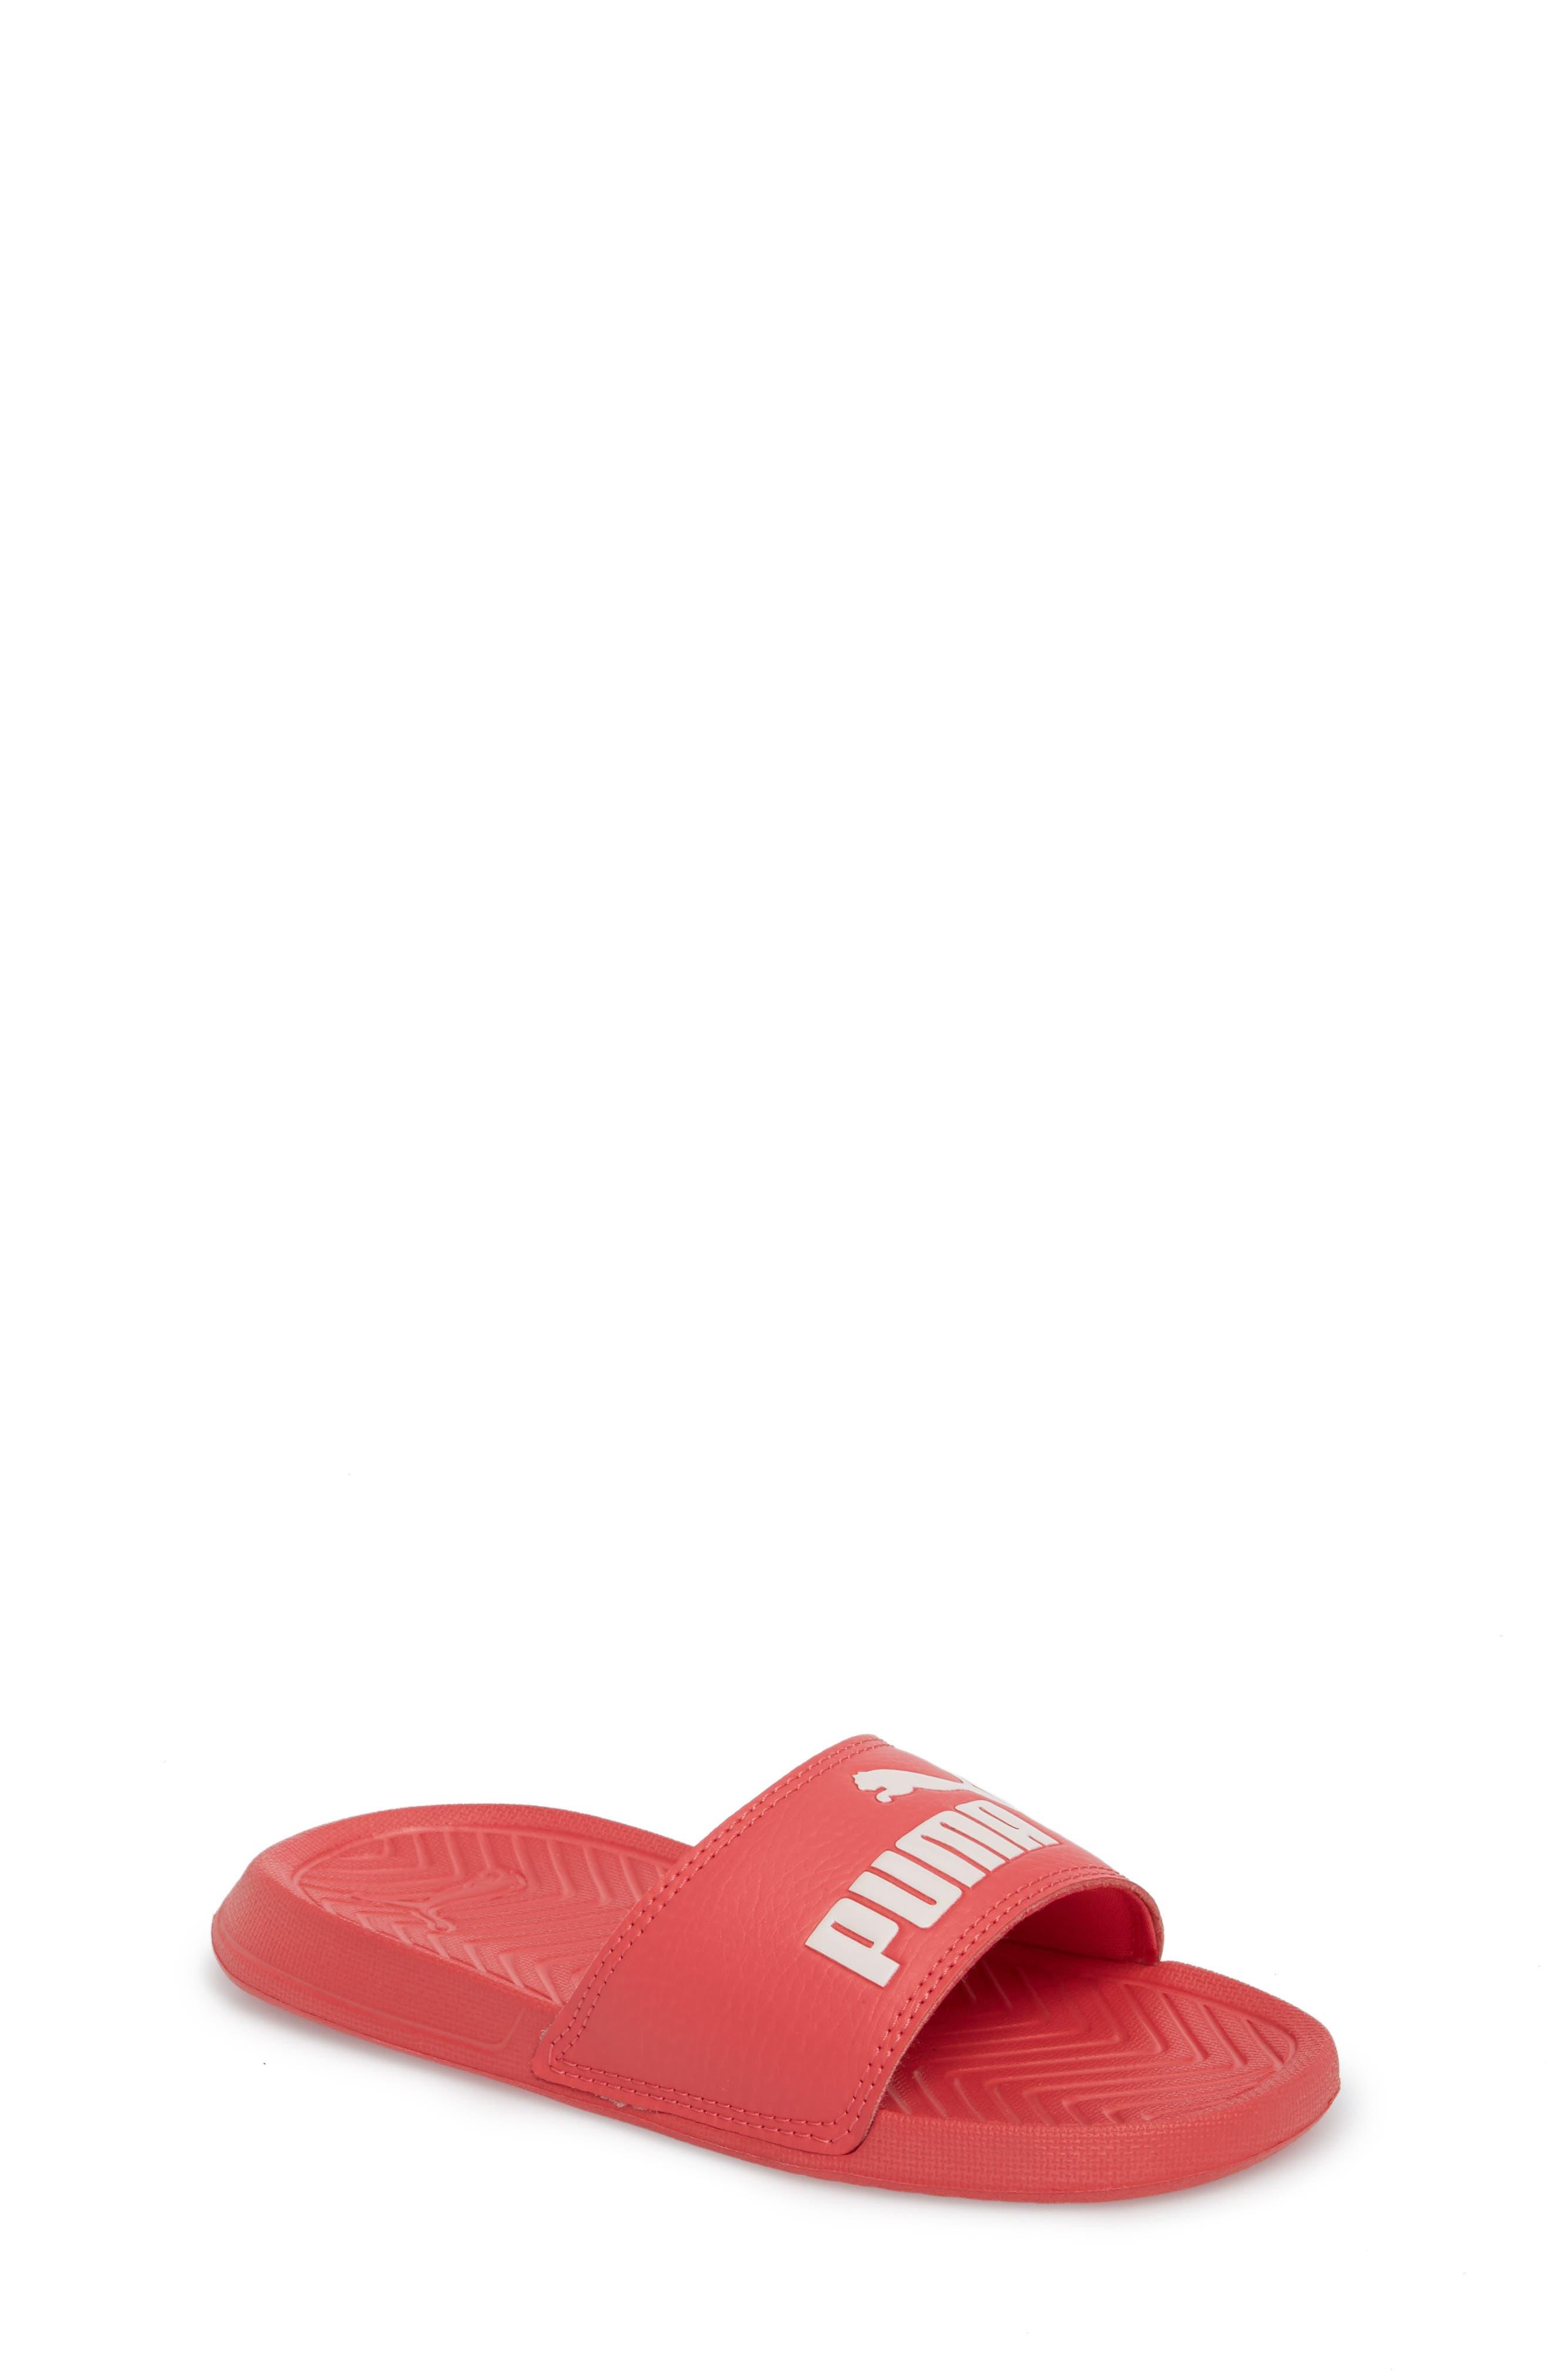 Popcat Slide Sandal,                         Main,                         color, Paradise Pink/ Pearl